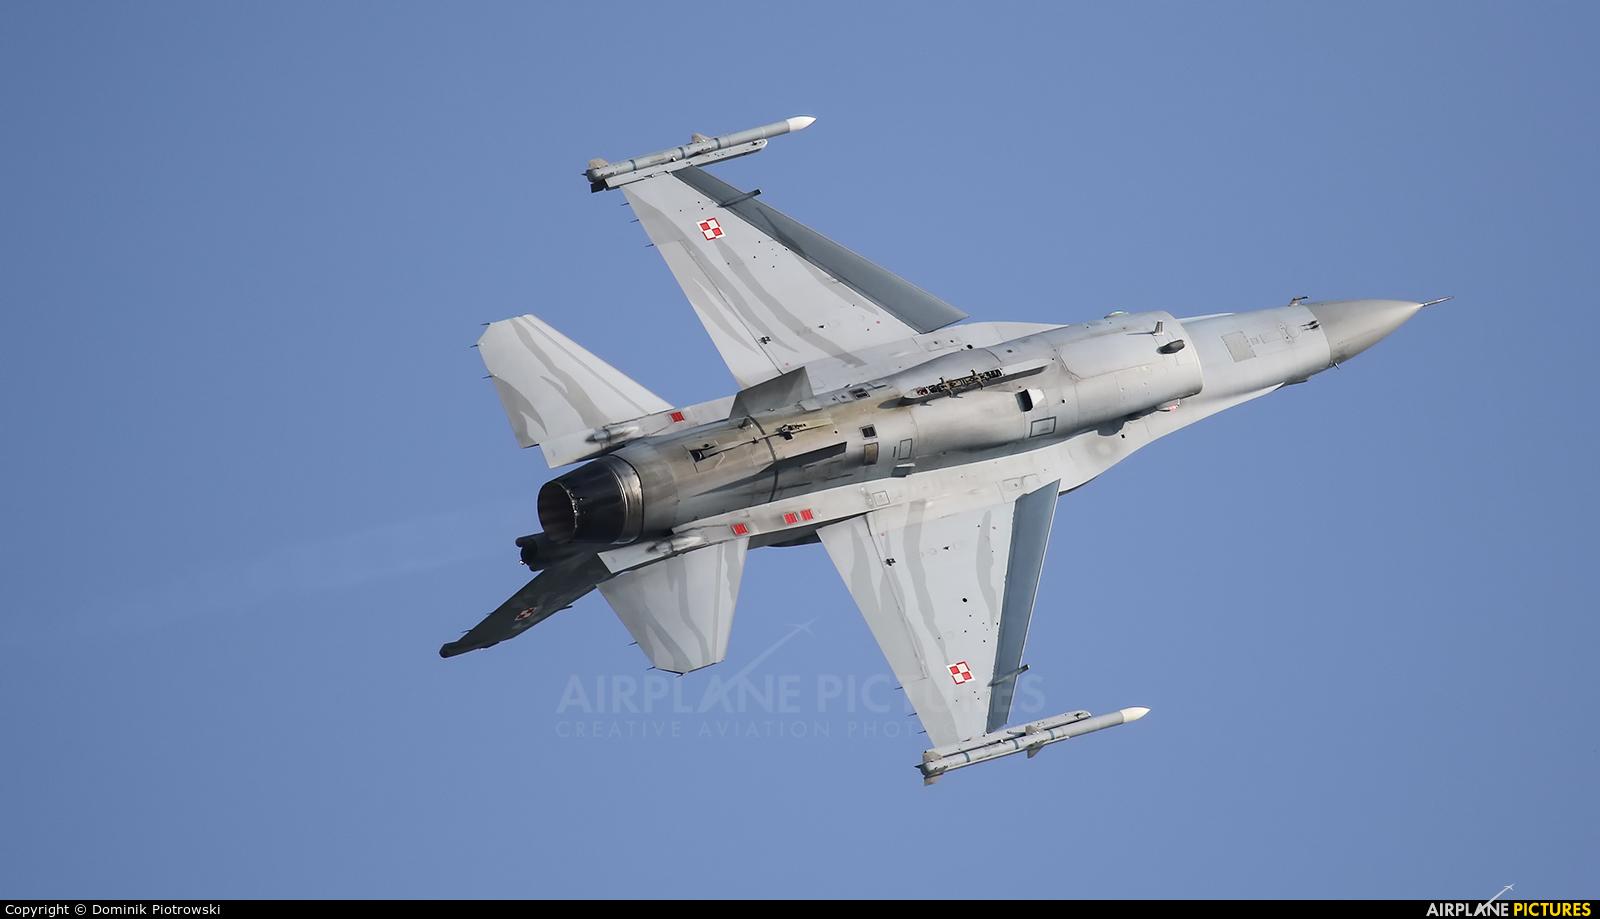 Poland - Air Force 4056 aircraft at Radom - Sadków